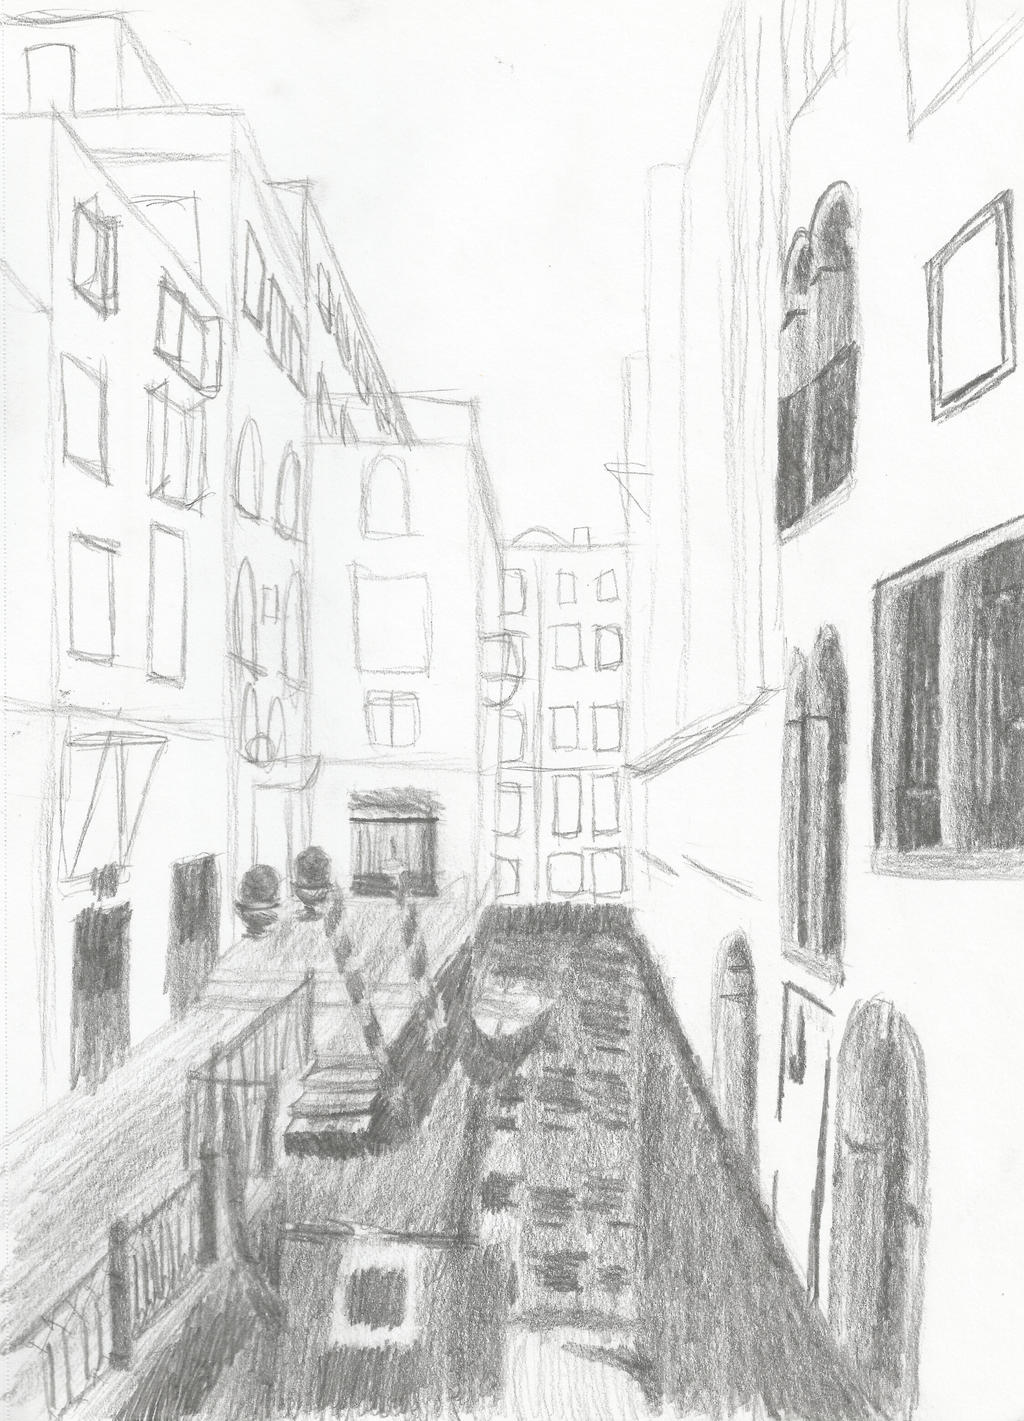 Venice Sketch by Dragimal